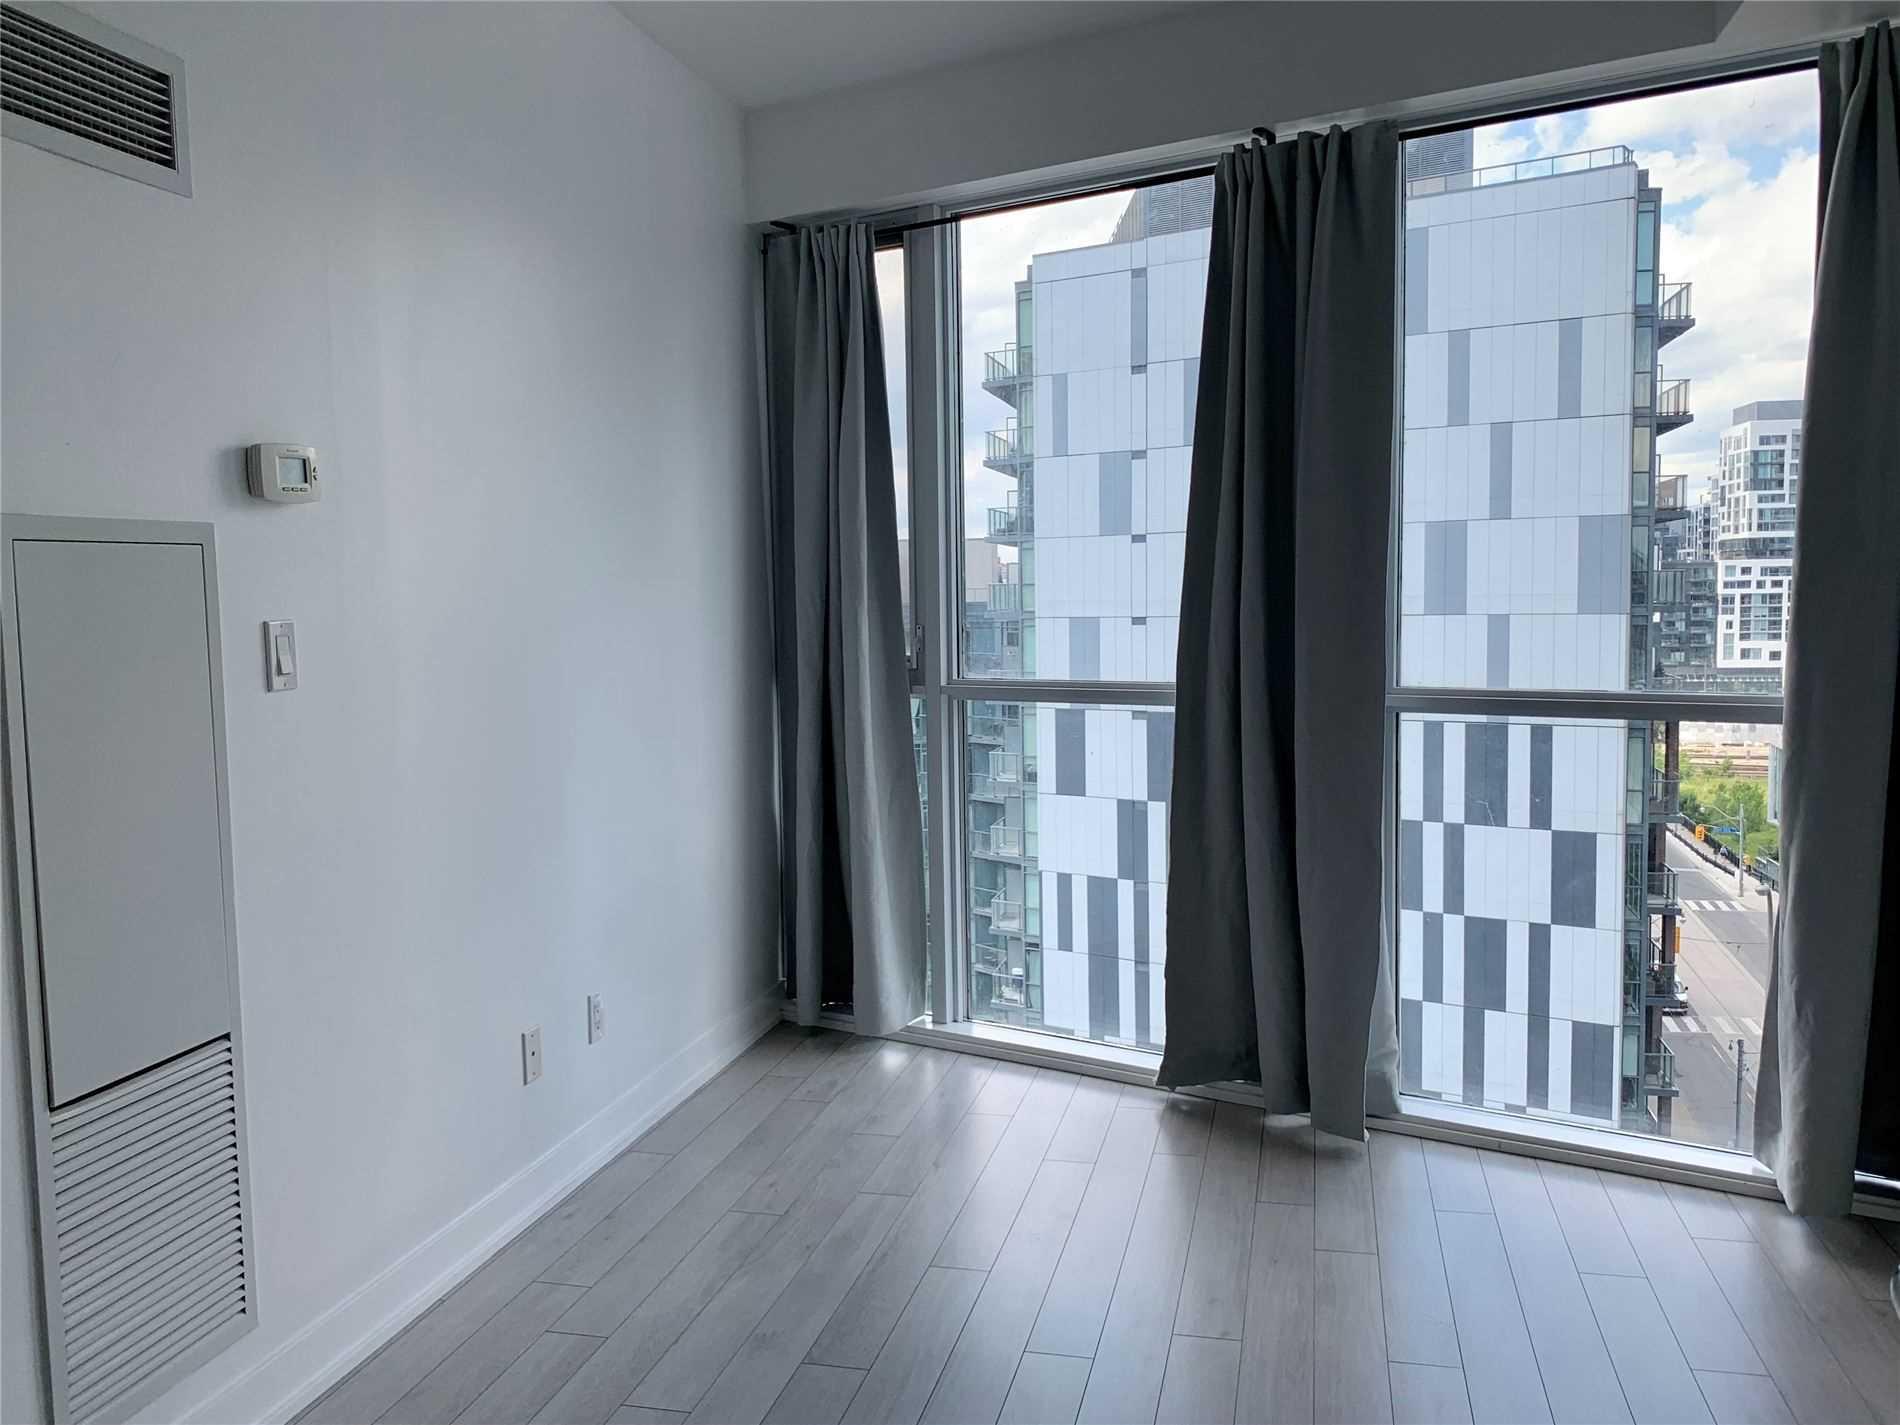 Condo Apt For Lease In Toronto , 1 Bedroom Bedrooms, ,1 BathroomBathrooms,Condo Apt,For Lease,1105,Bruyeres